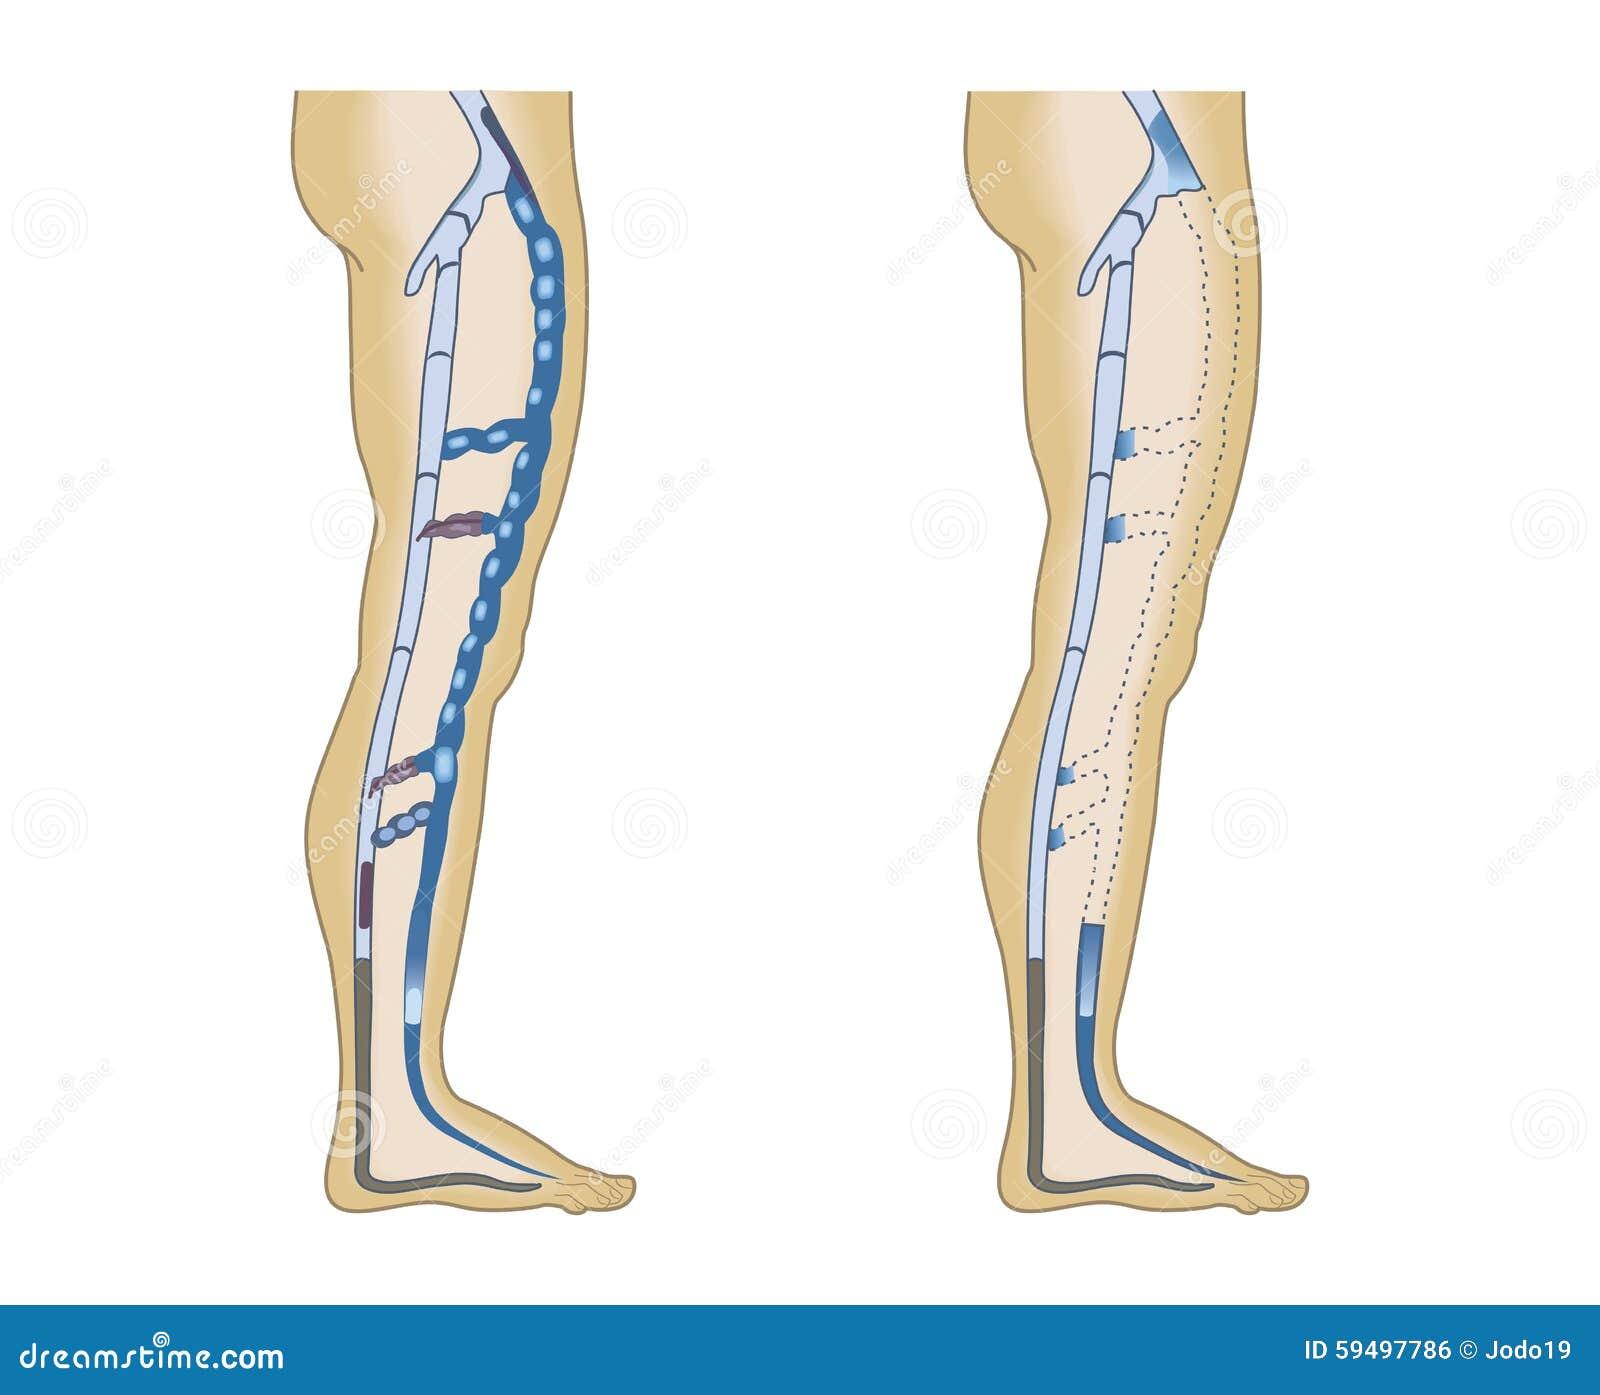 Illustration leg veins stock vector. Illustration of veins - 59497786